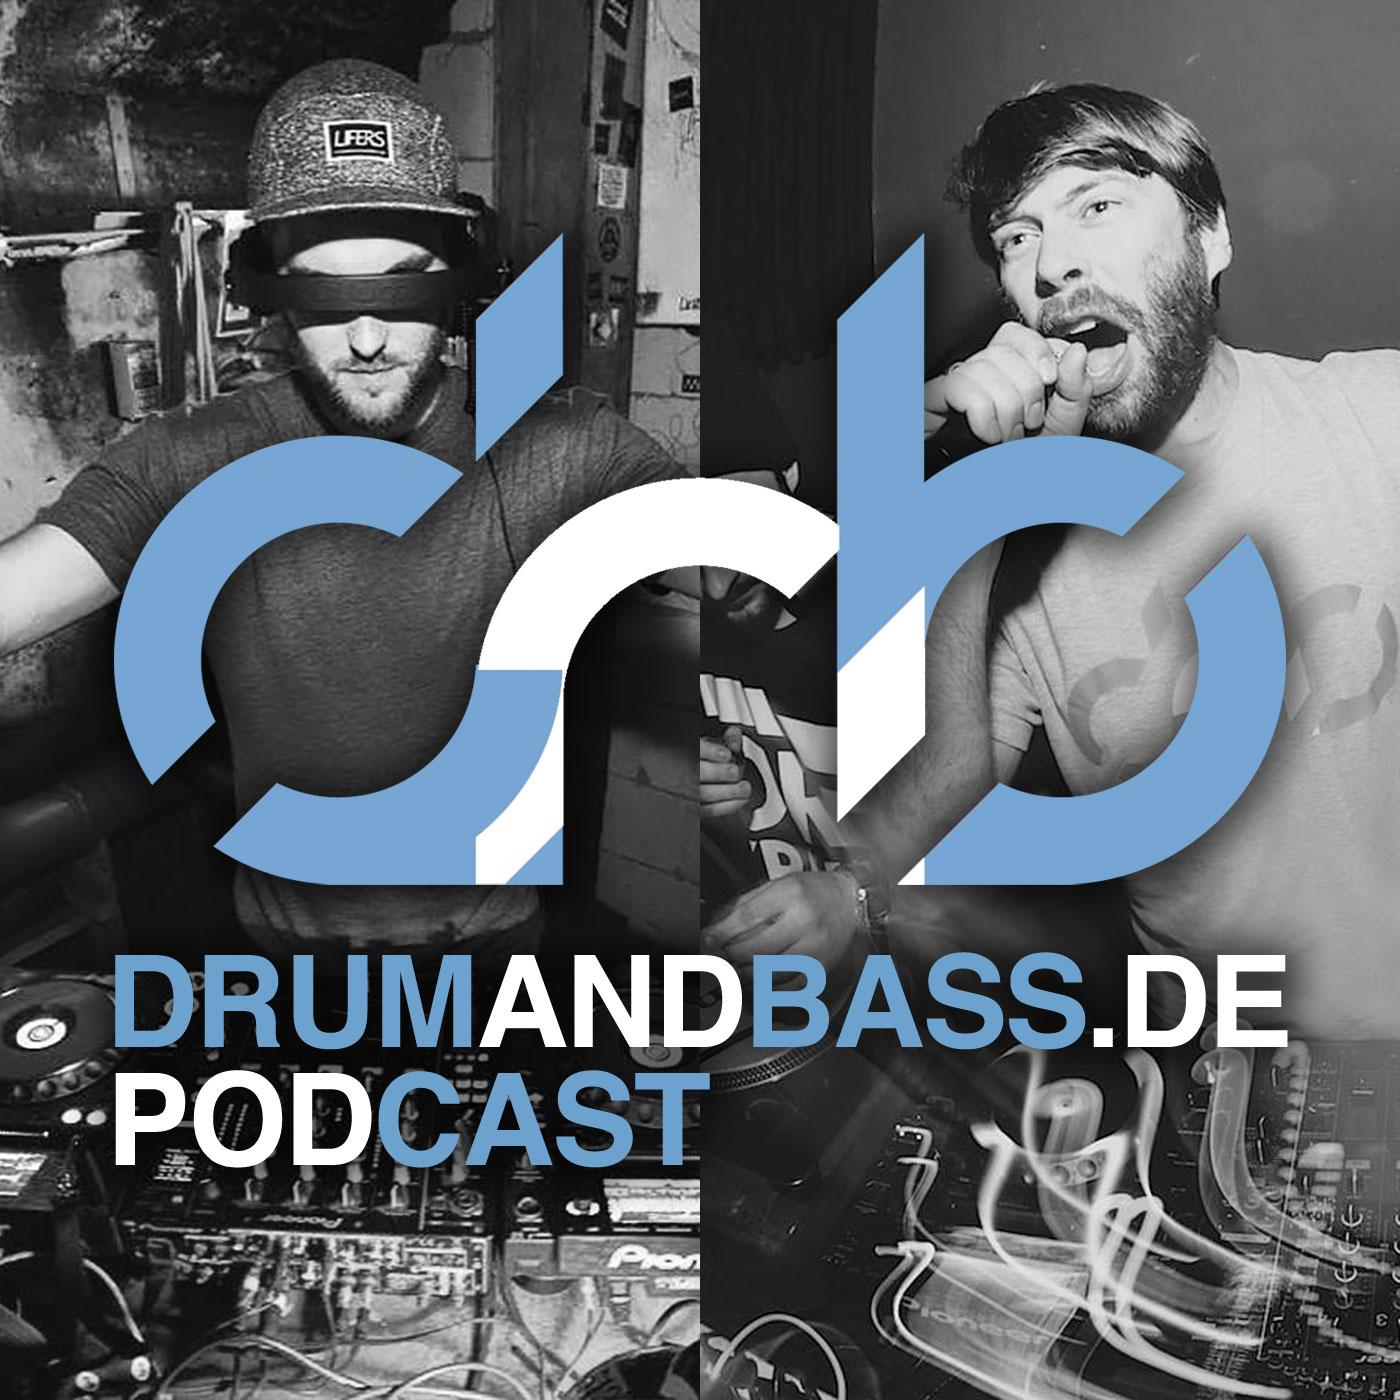 drumandbass.de Podcast